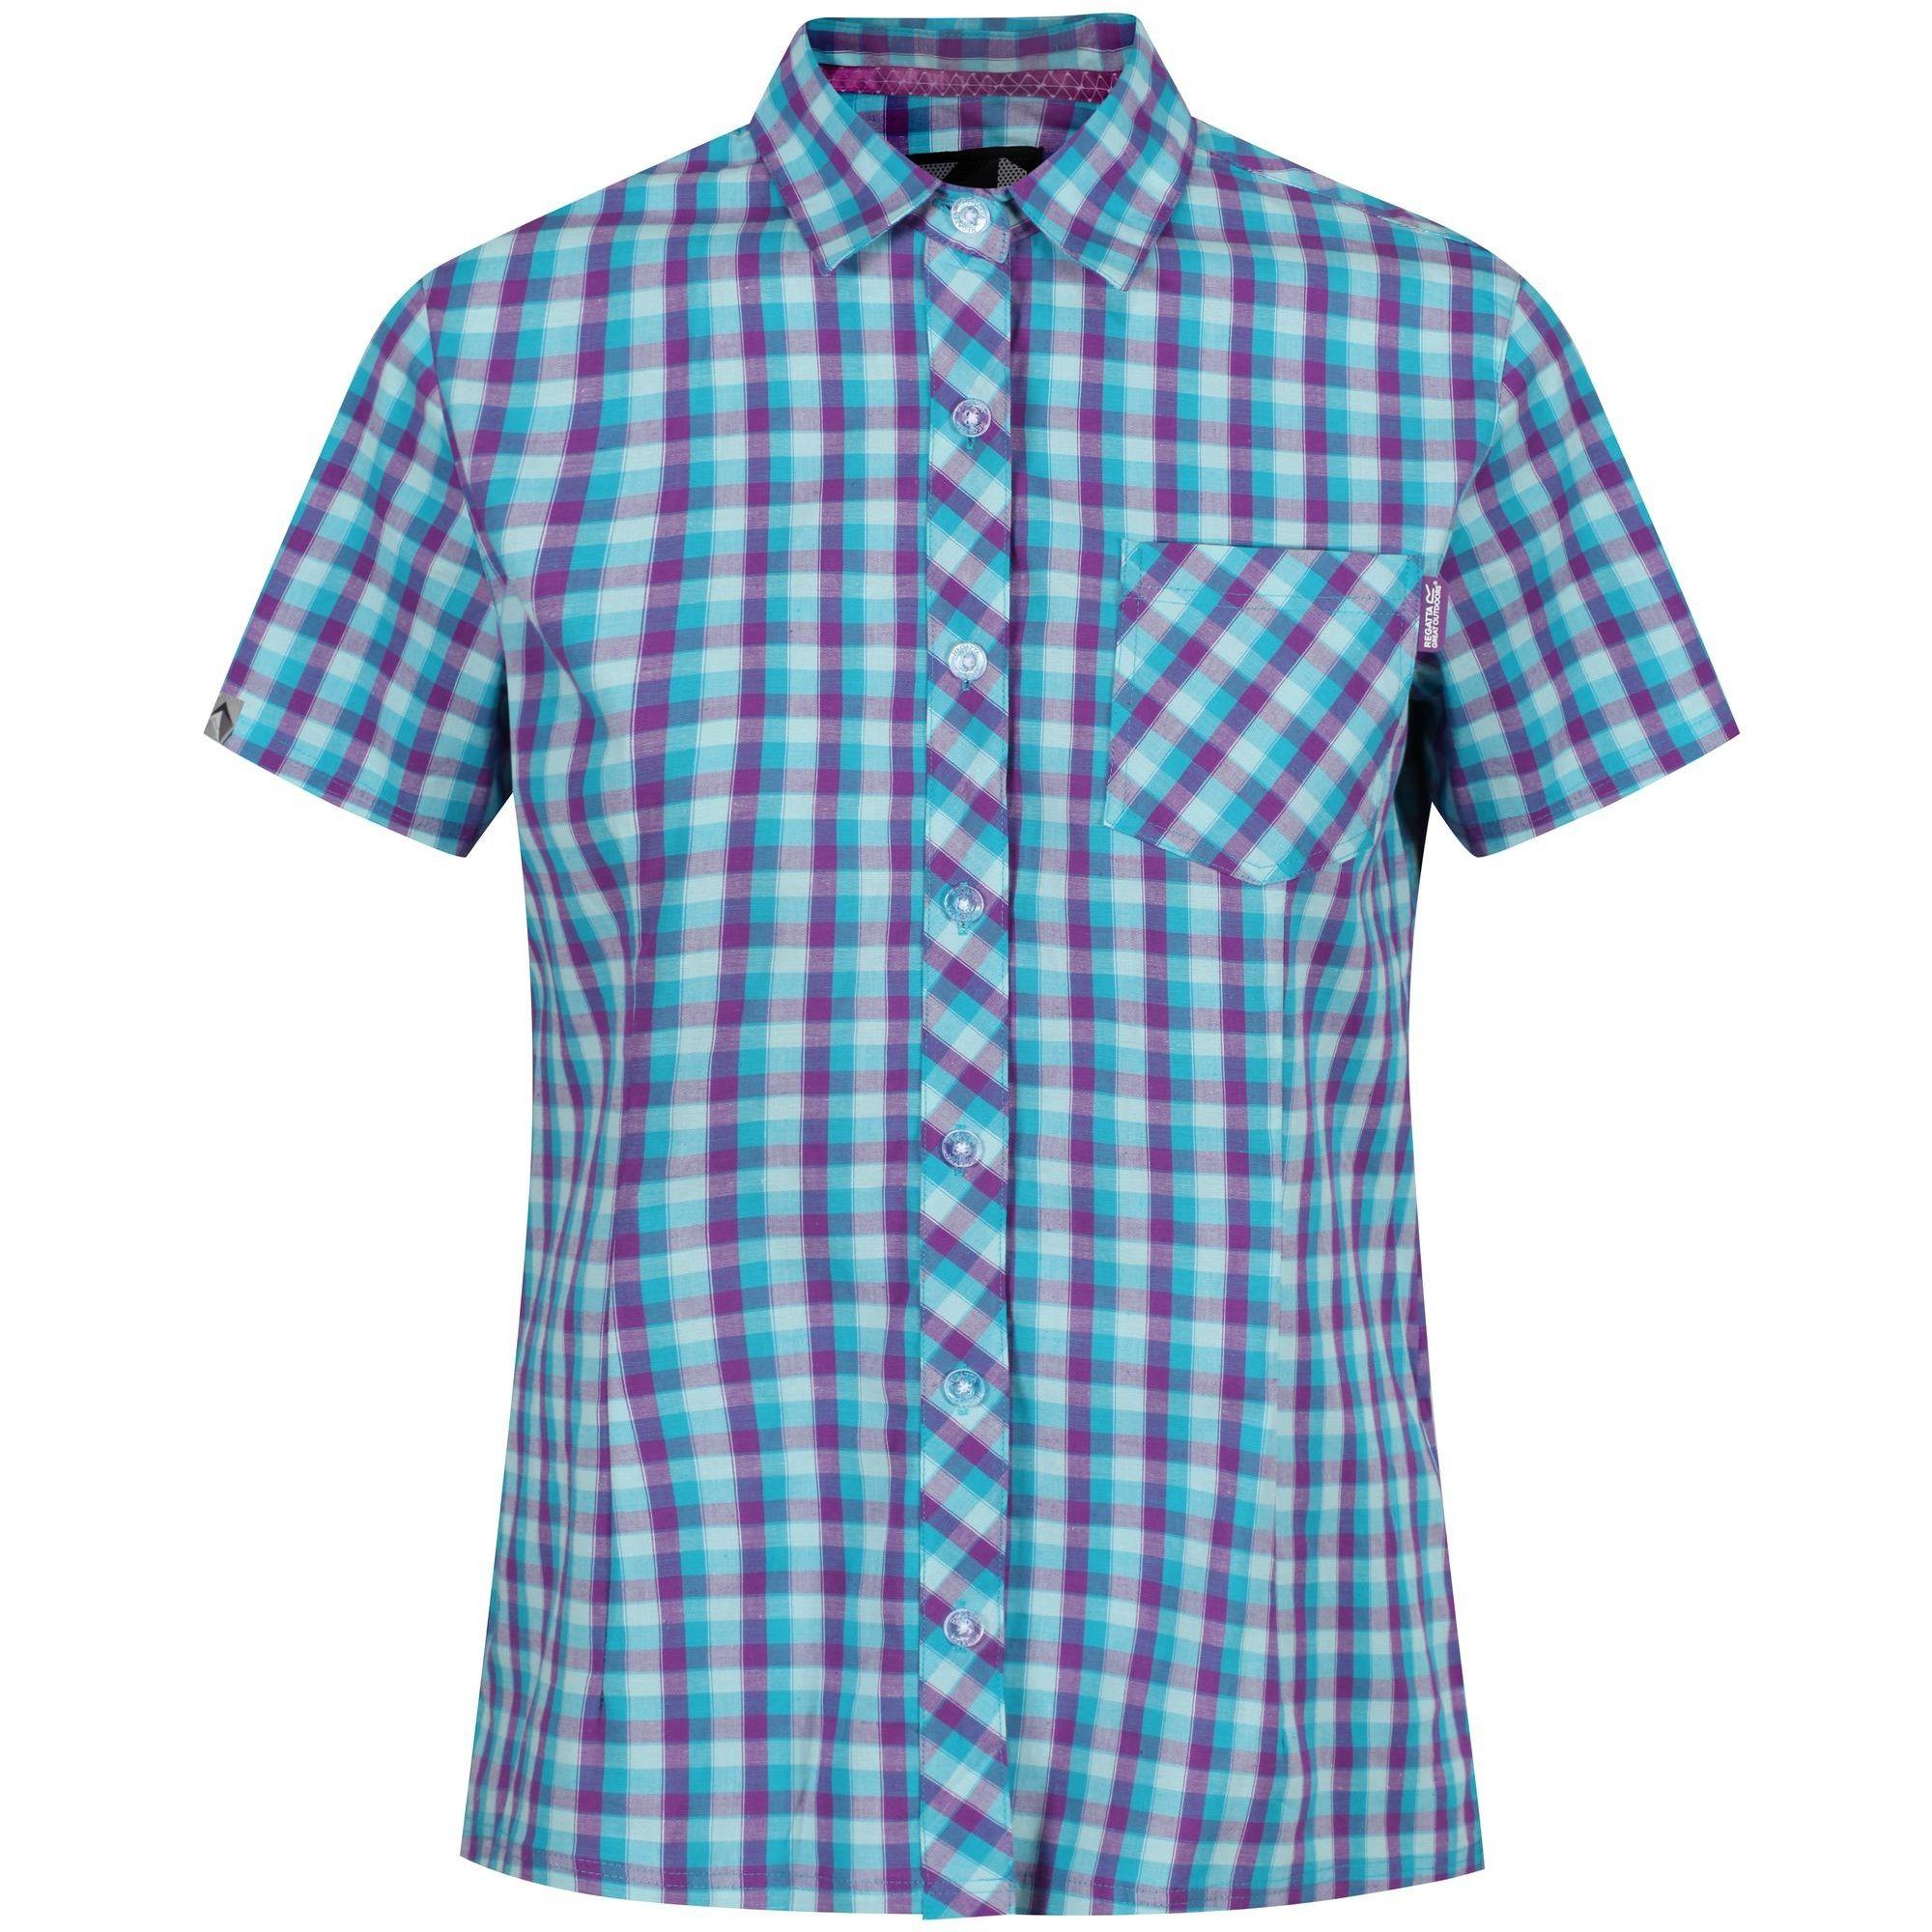 Regatta Womens/Ladies Honshu II Short Sleeve Shirt